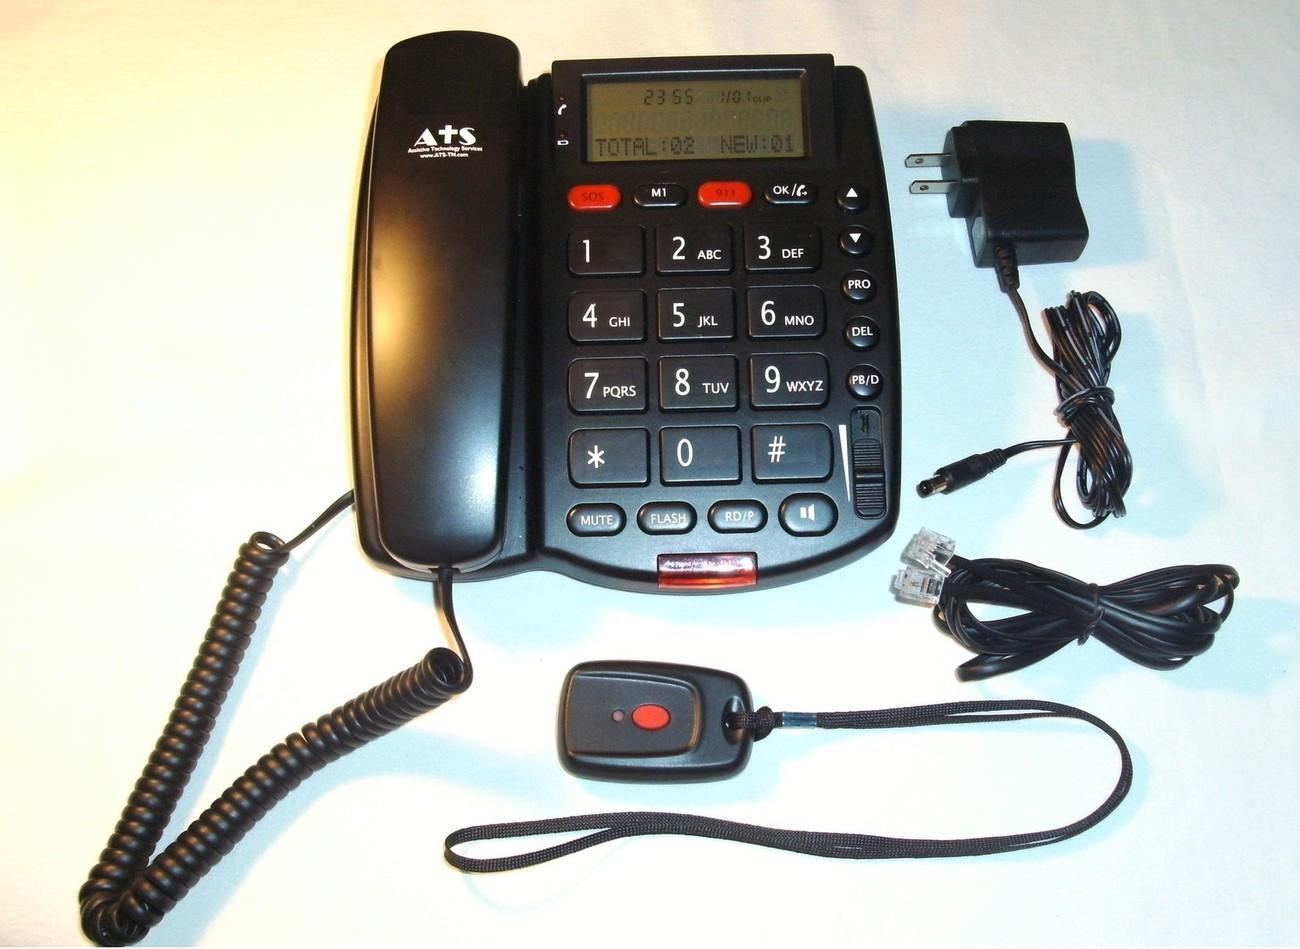 Radio Shack Medical Alert System No Monthly Fees Ever